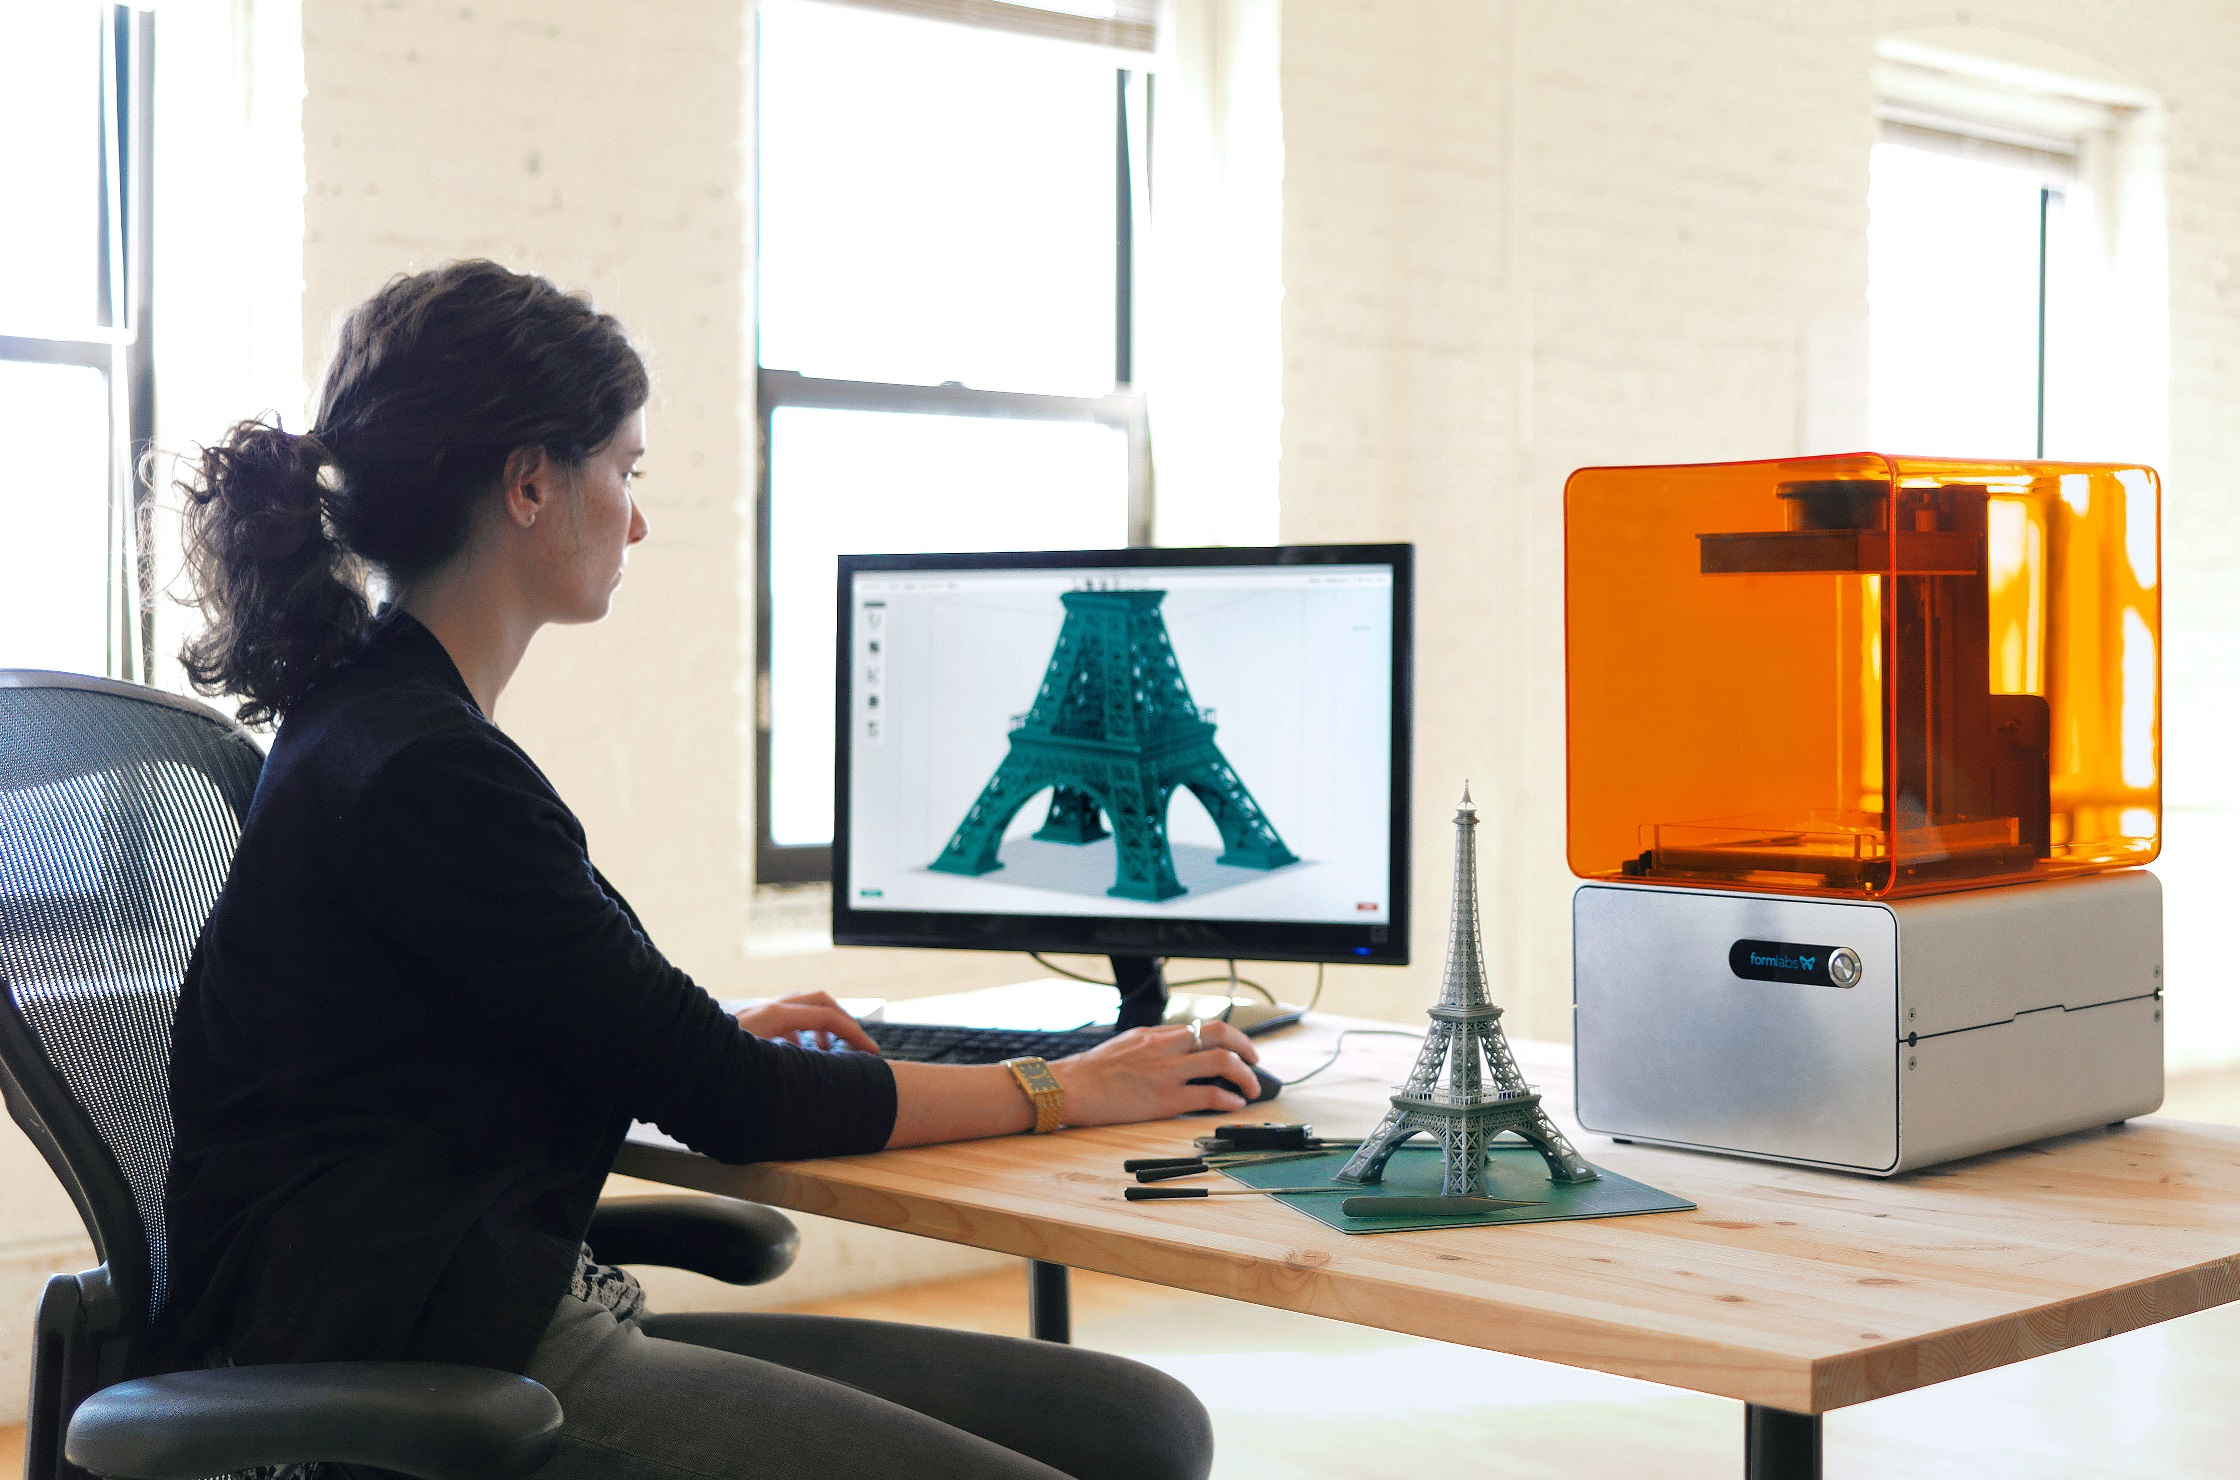 beginner guide 3D printing